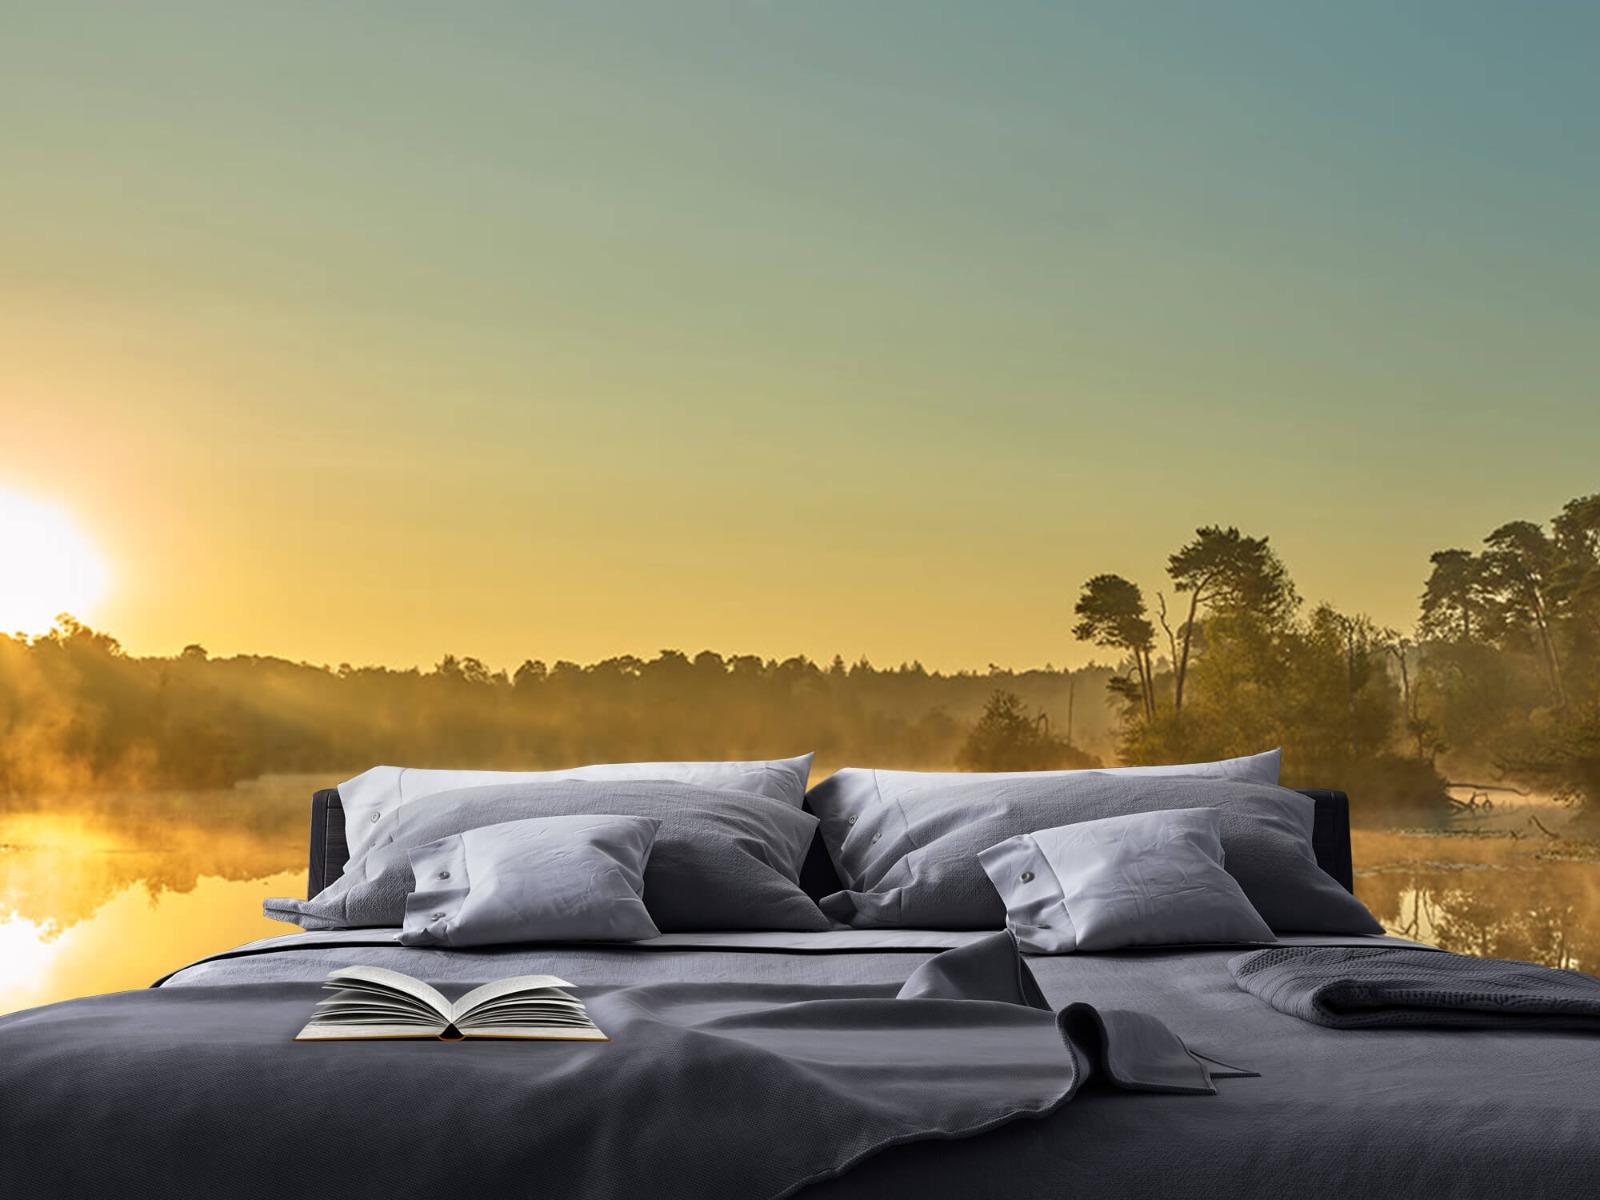 Mist - Zonsopkomst bij bosmeer - Slaapkamer 17